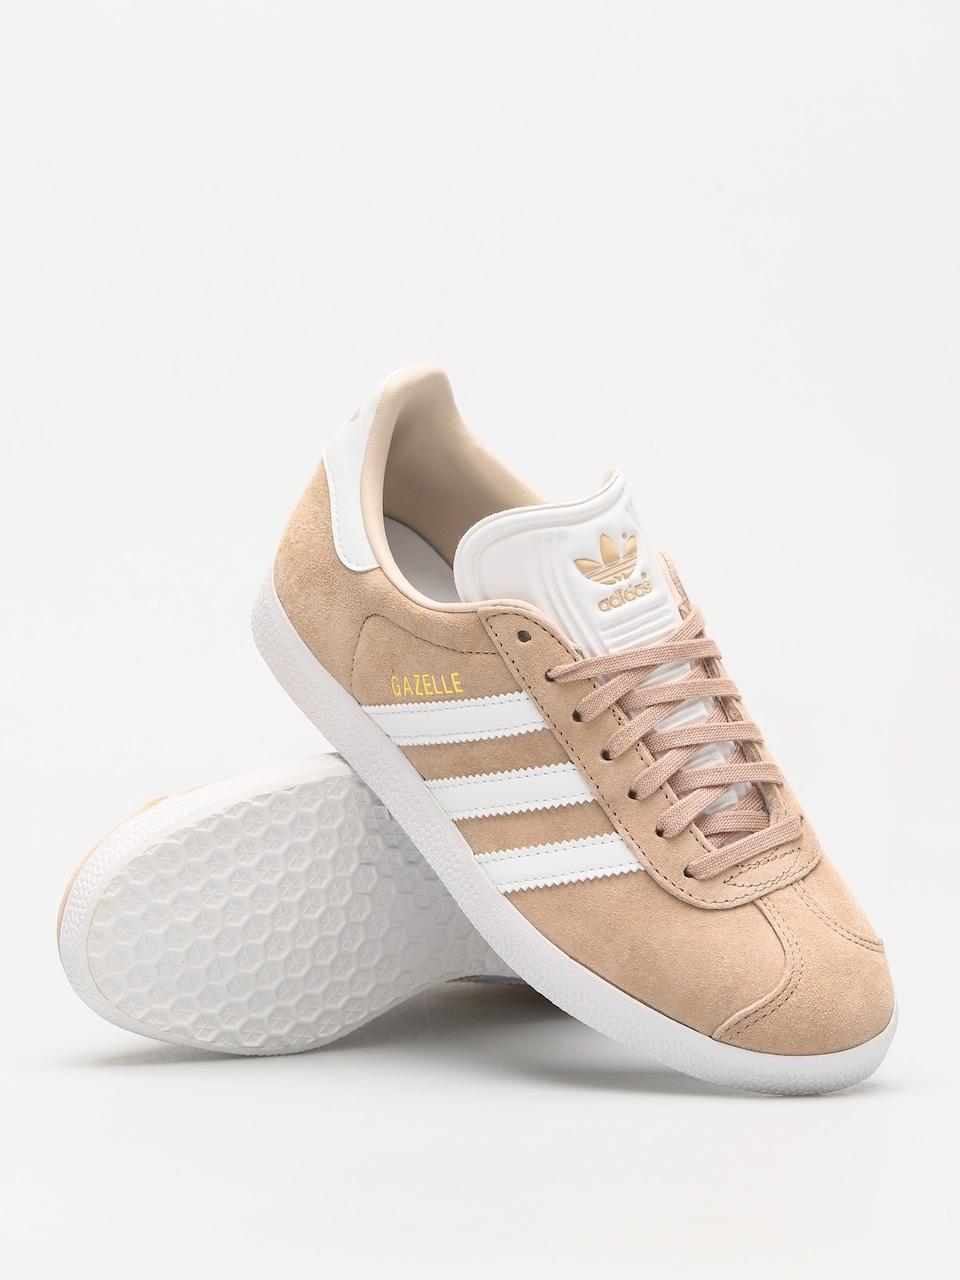 Adidas Gazelle Shoes Wmn Ashpea Ftwwht Linen